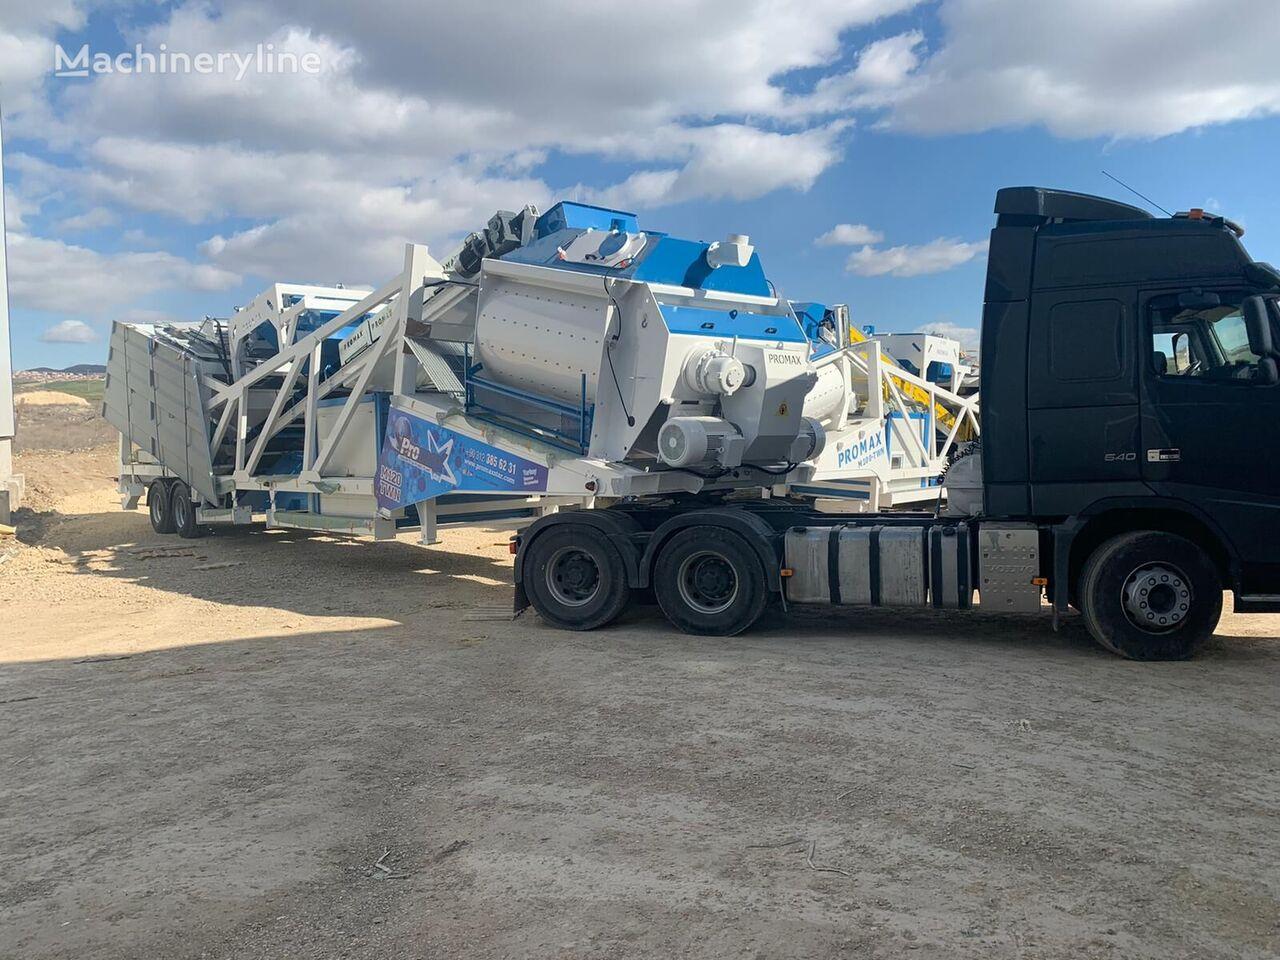 جديد ماكينة صناعة الخرسانة PROMAX Mobile Concrete Batching Plant M120-TWN (120m3/h)